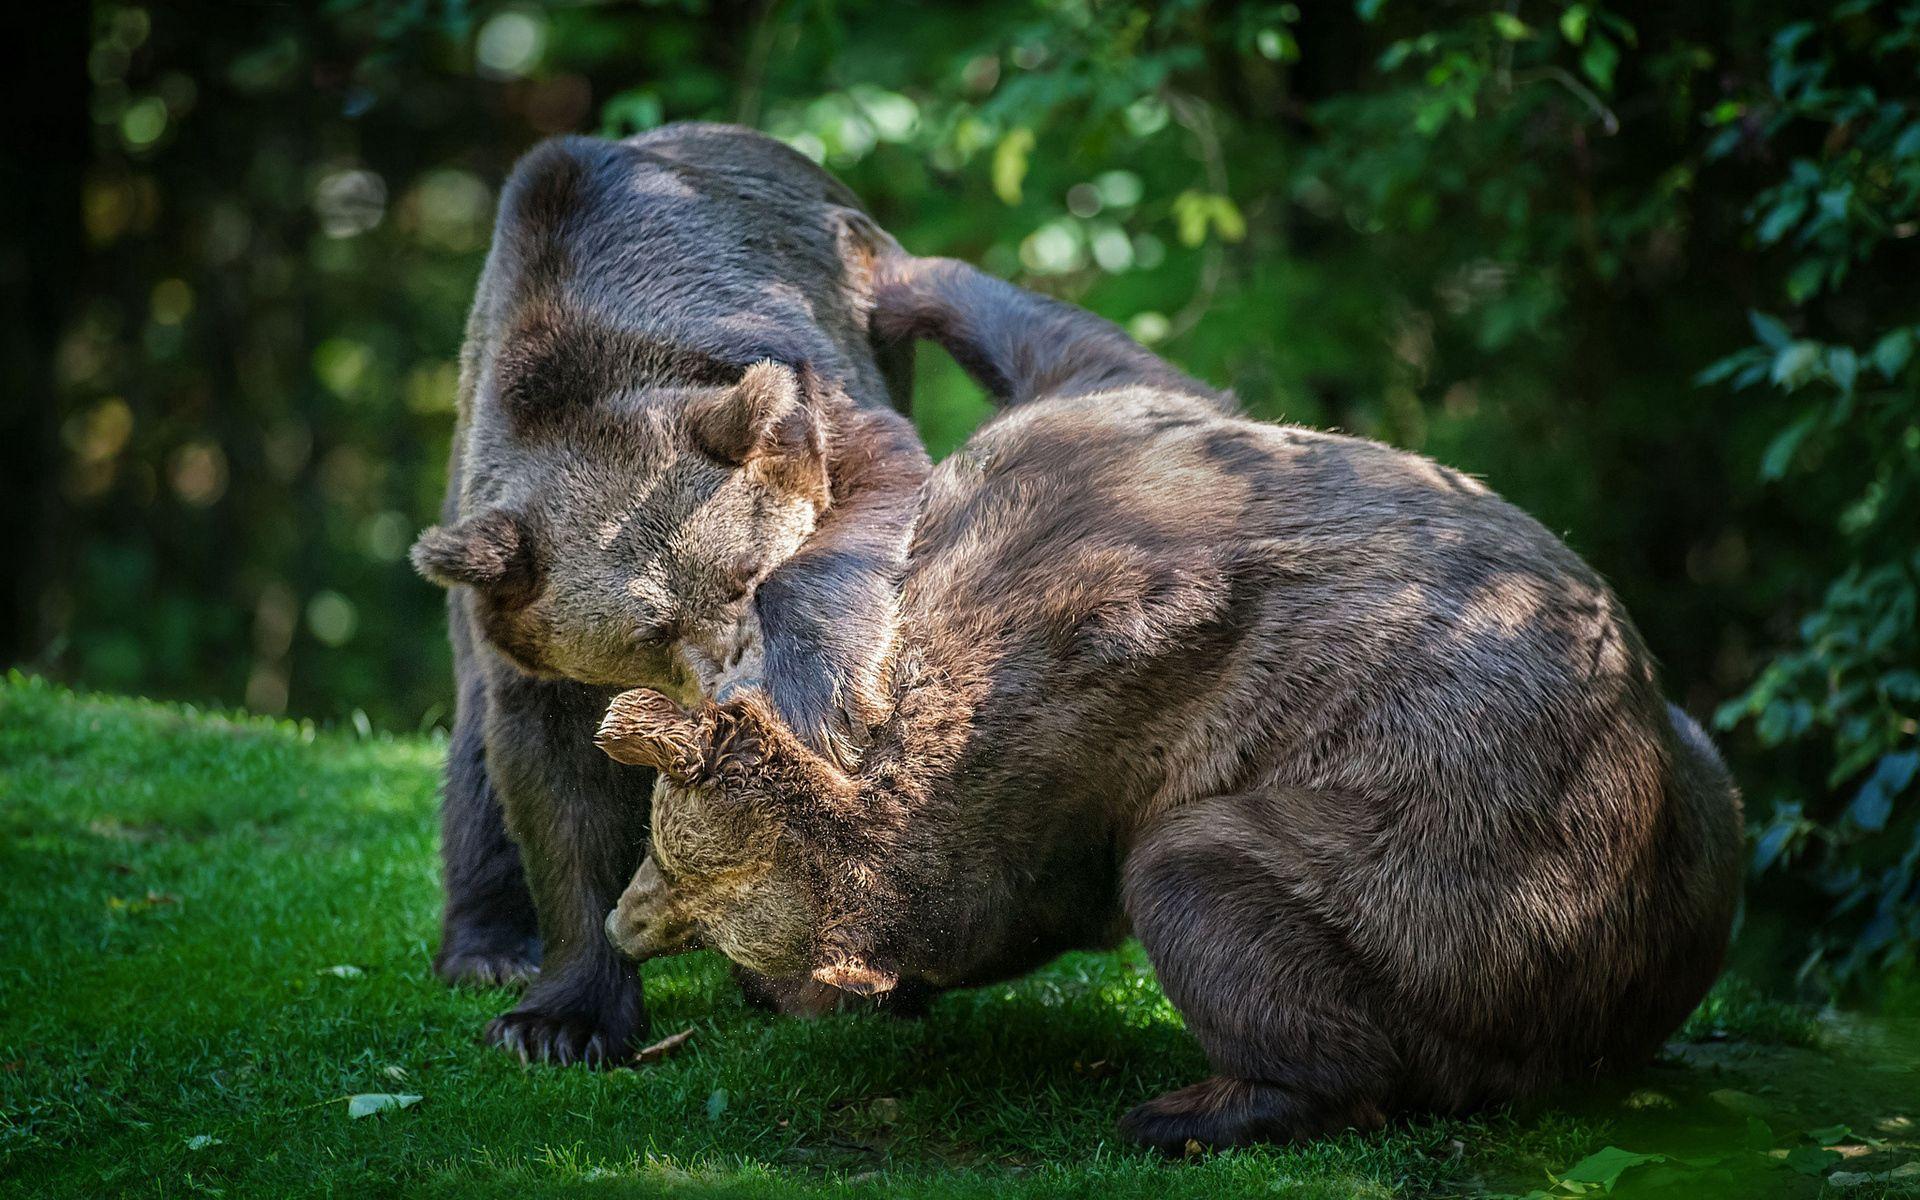 138111 Заставки и Обои Медведи на телефон. Скачать Животные, Трава, Медведи, Пара, Драка картинки бесплатно